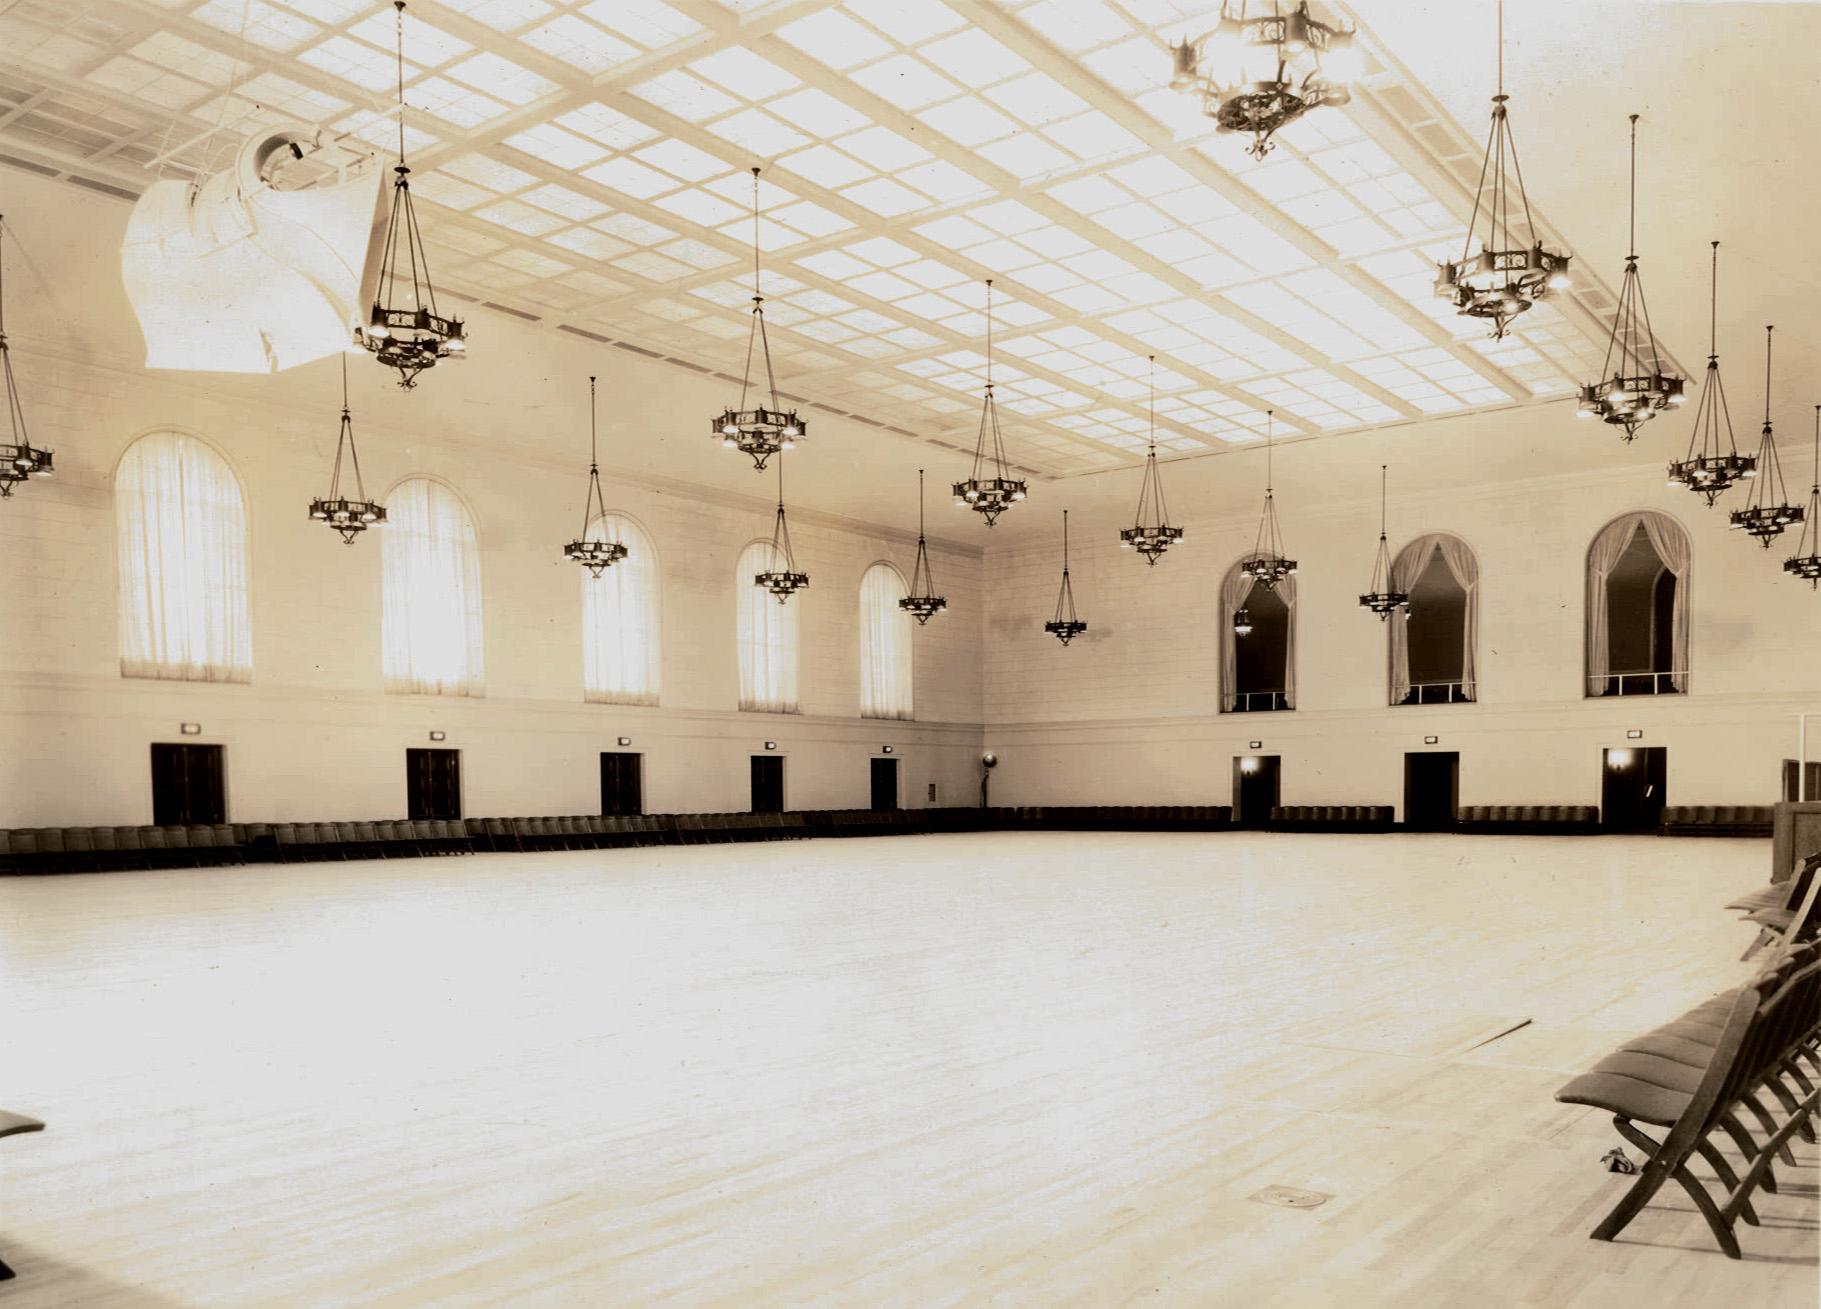 Exhibit Hall 1932-1.jpg